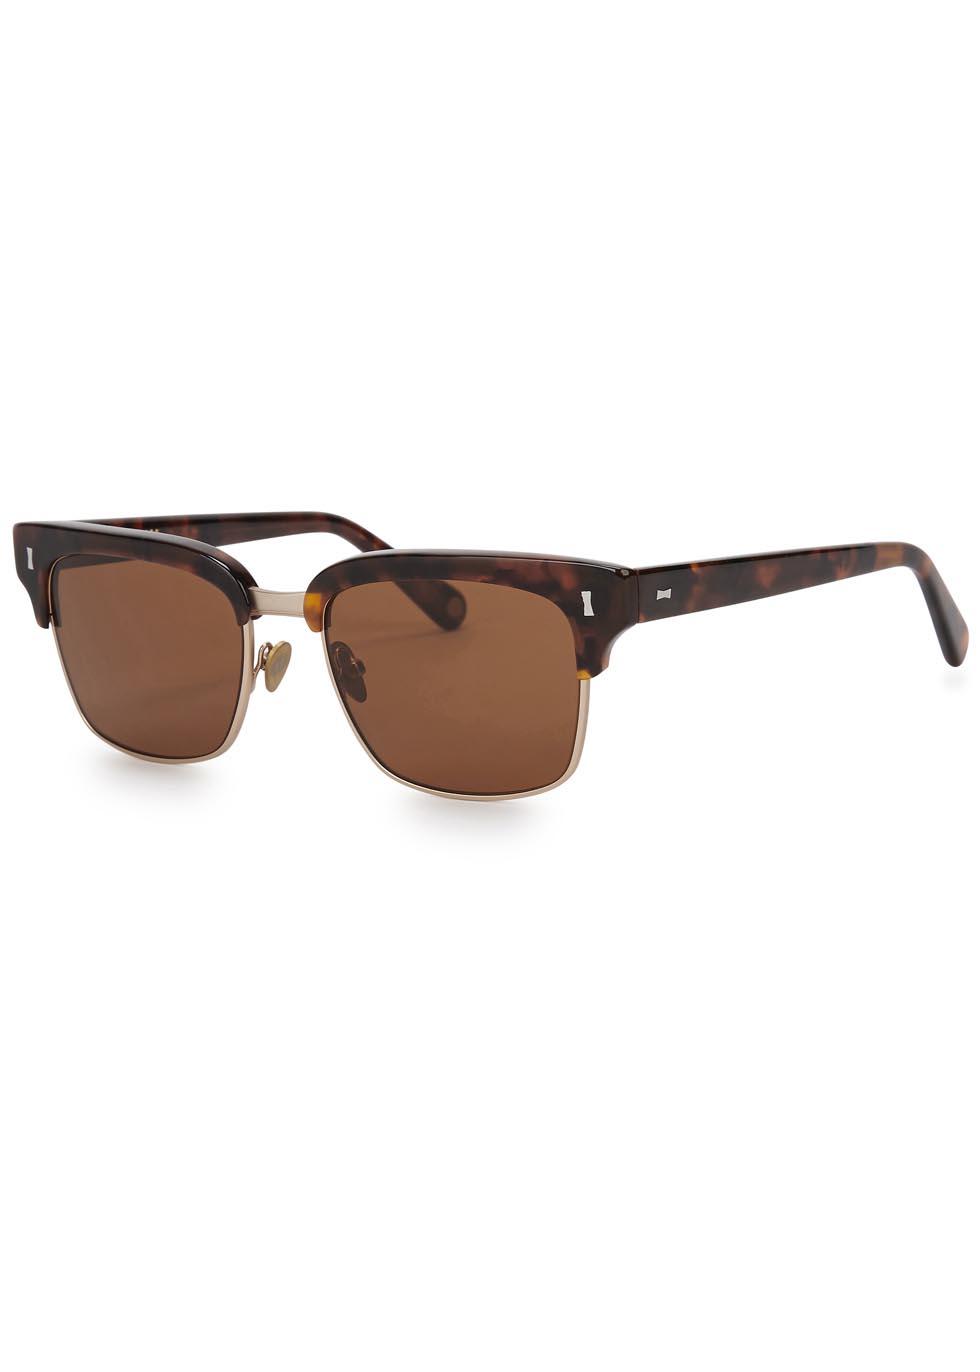 Wynford tortoiseshell sunglasses - CUBITTS